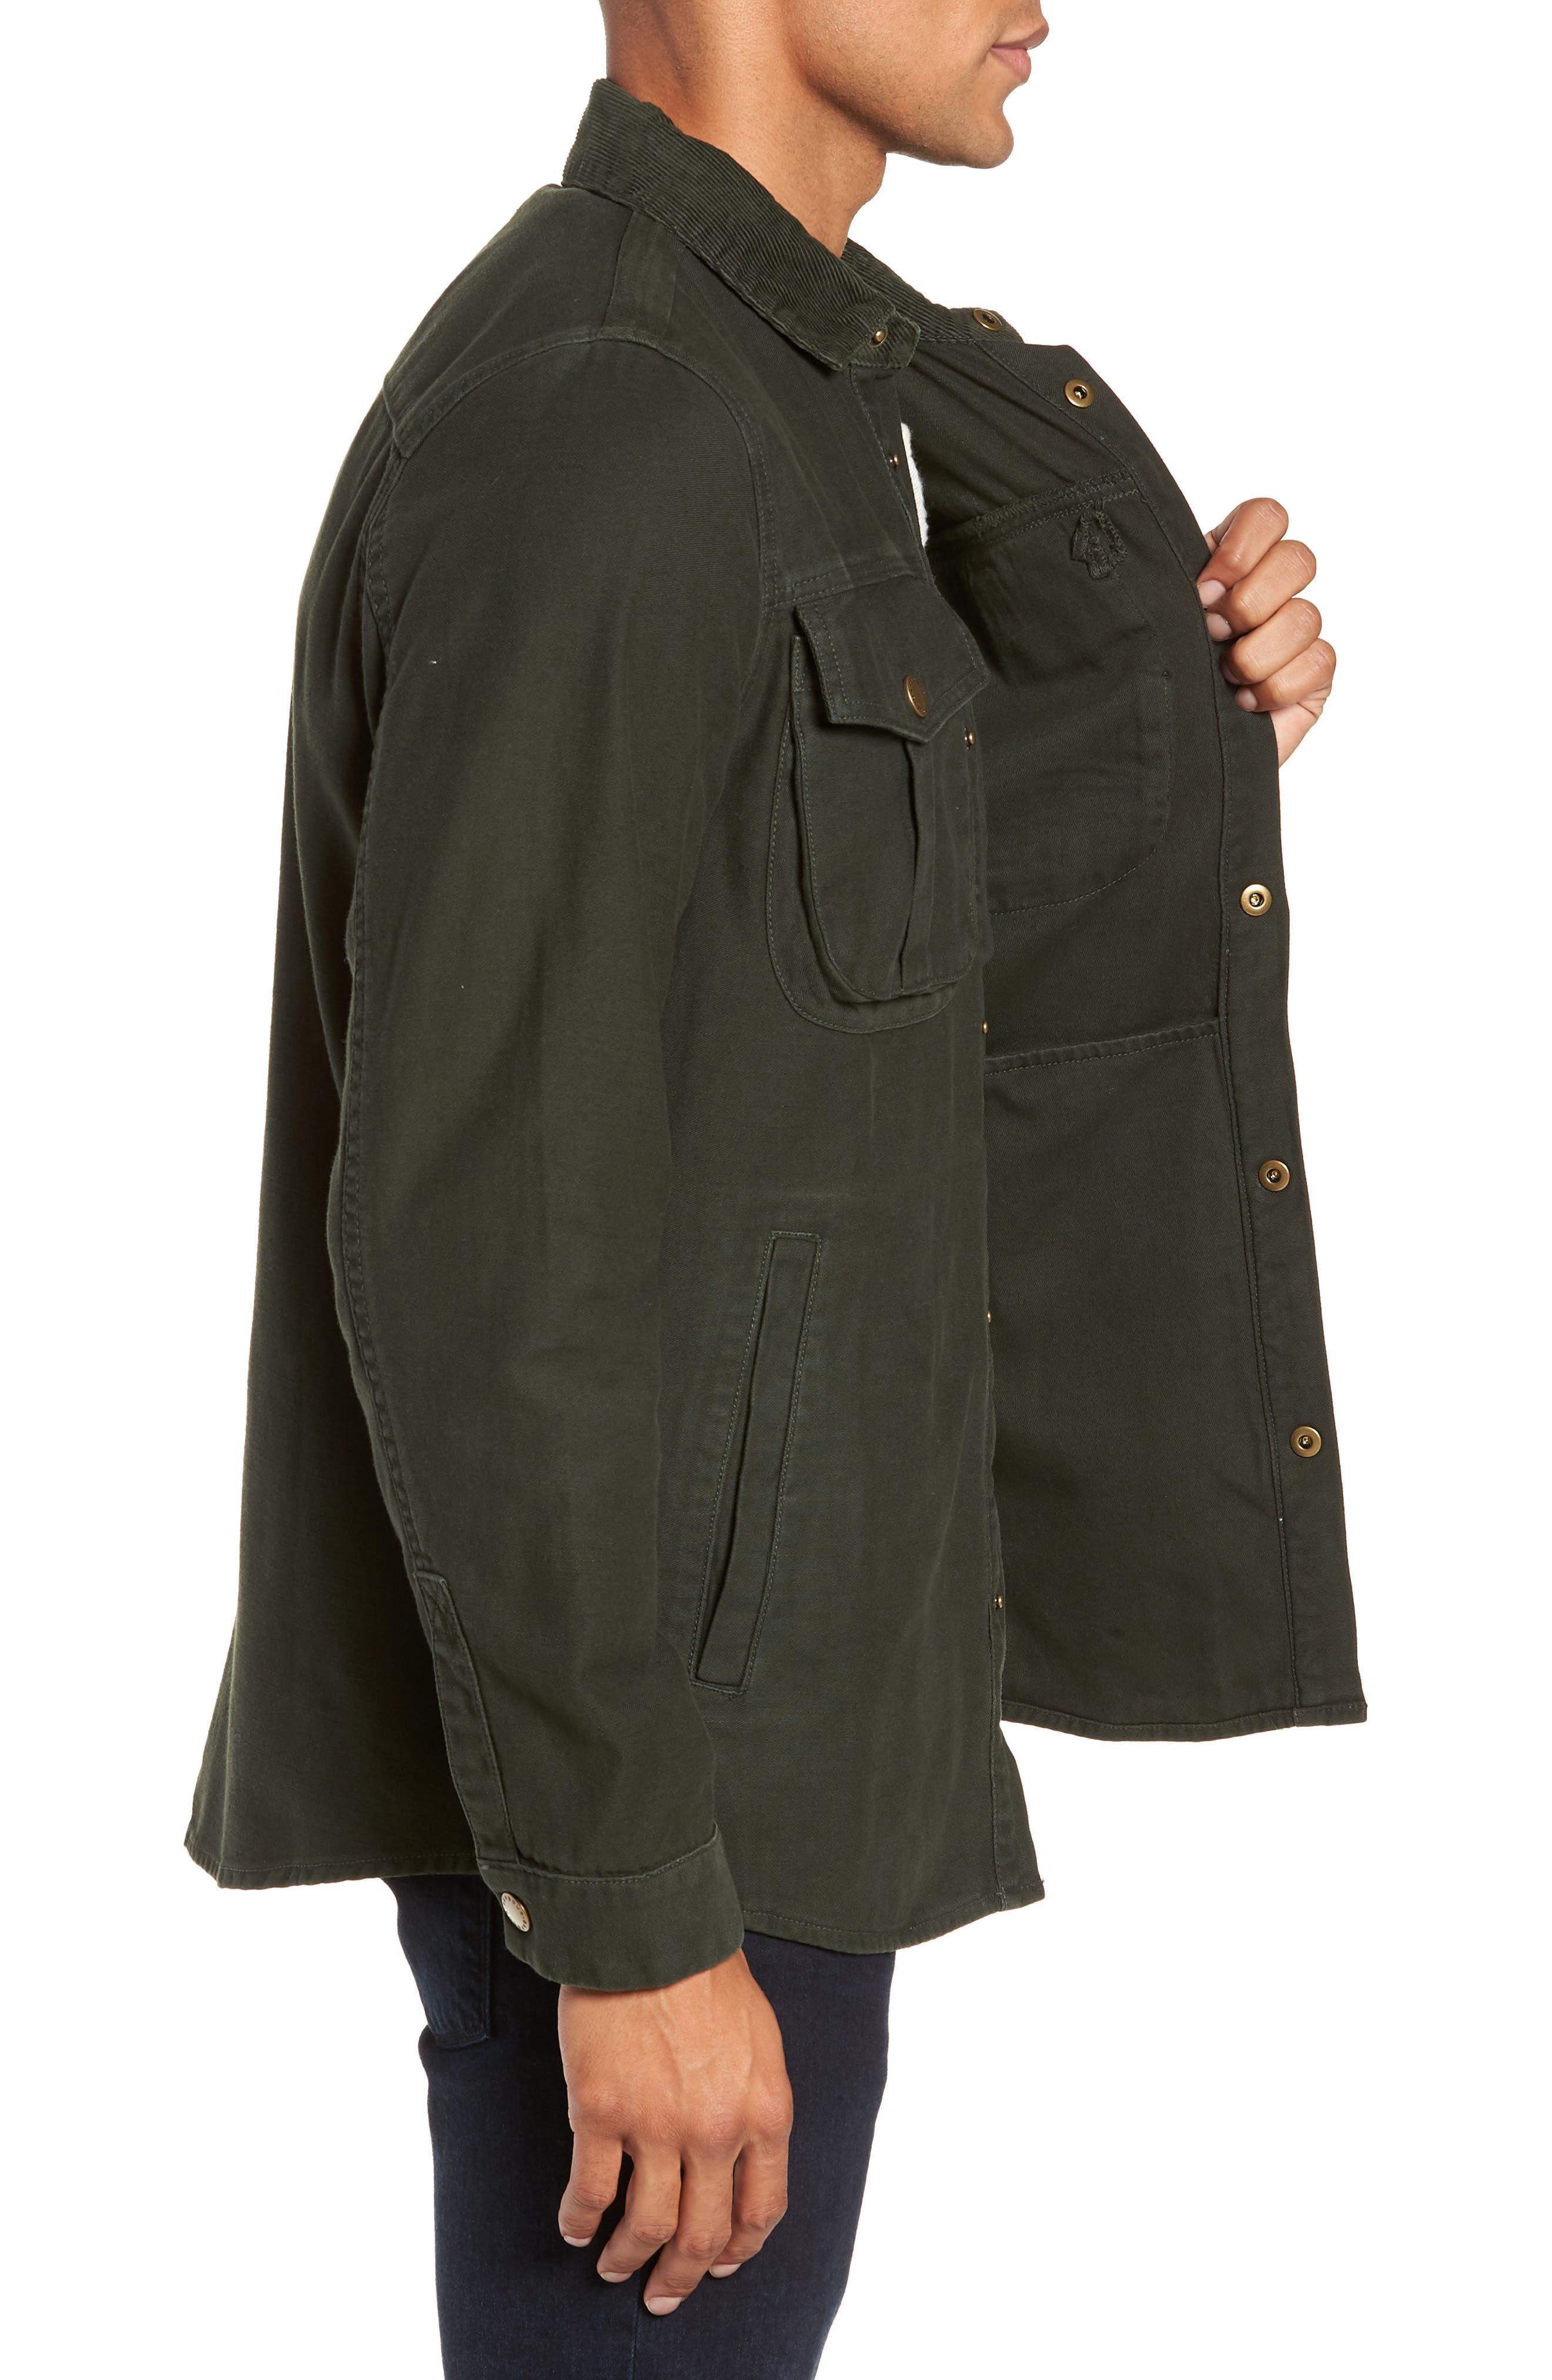 Deck Jacket,                             Alternate thumbnail 3, color,                             SEAWEED